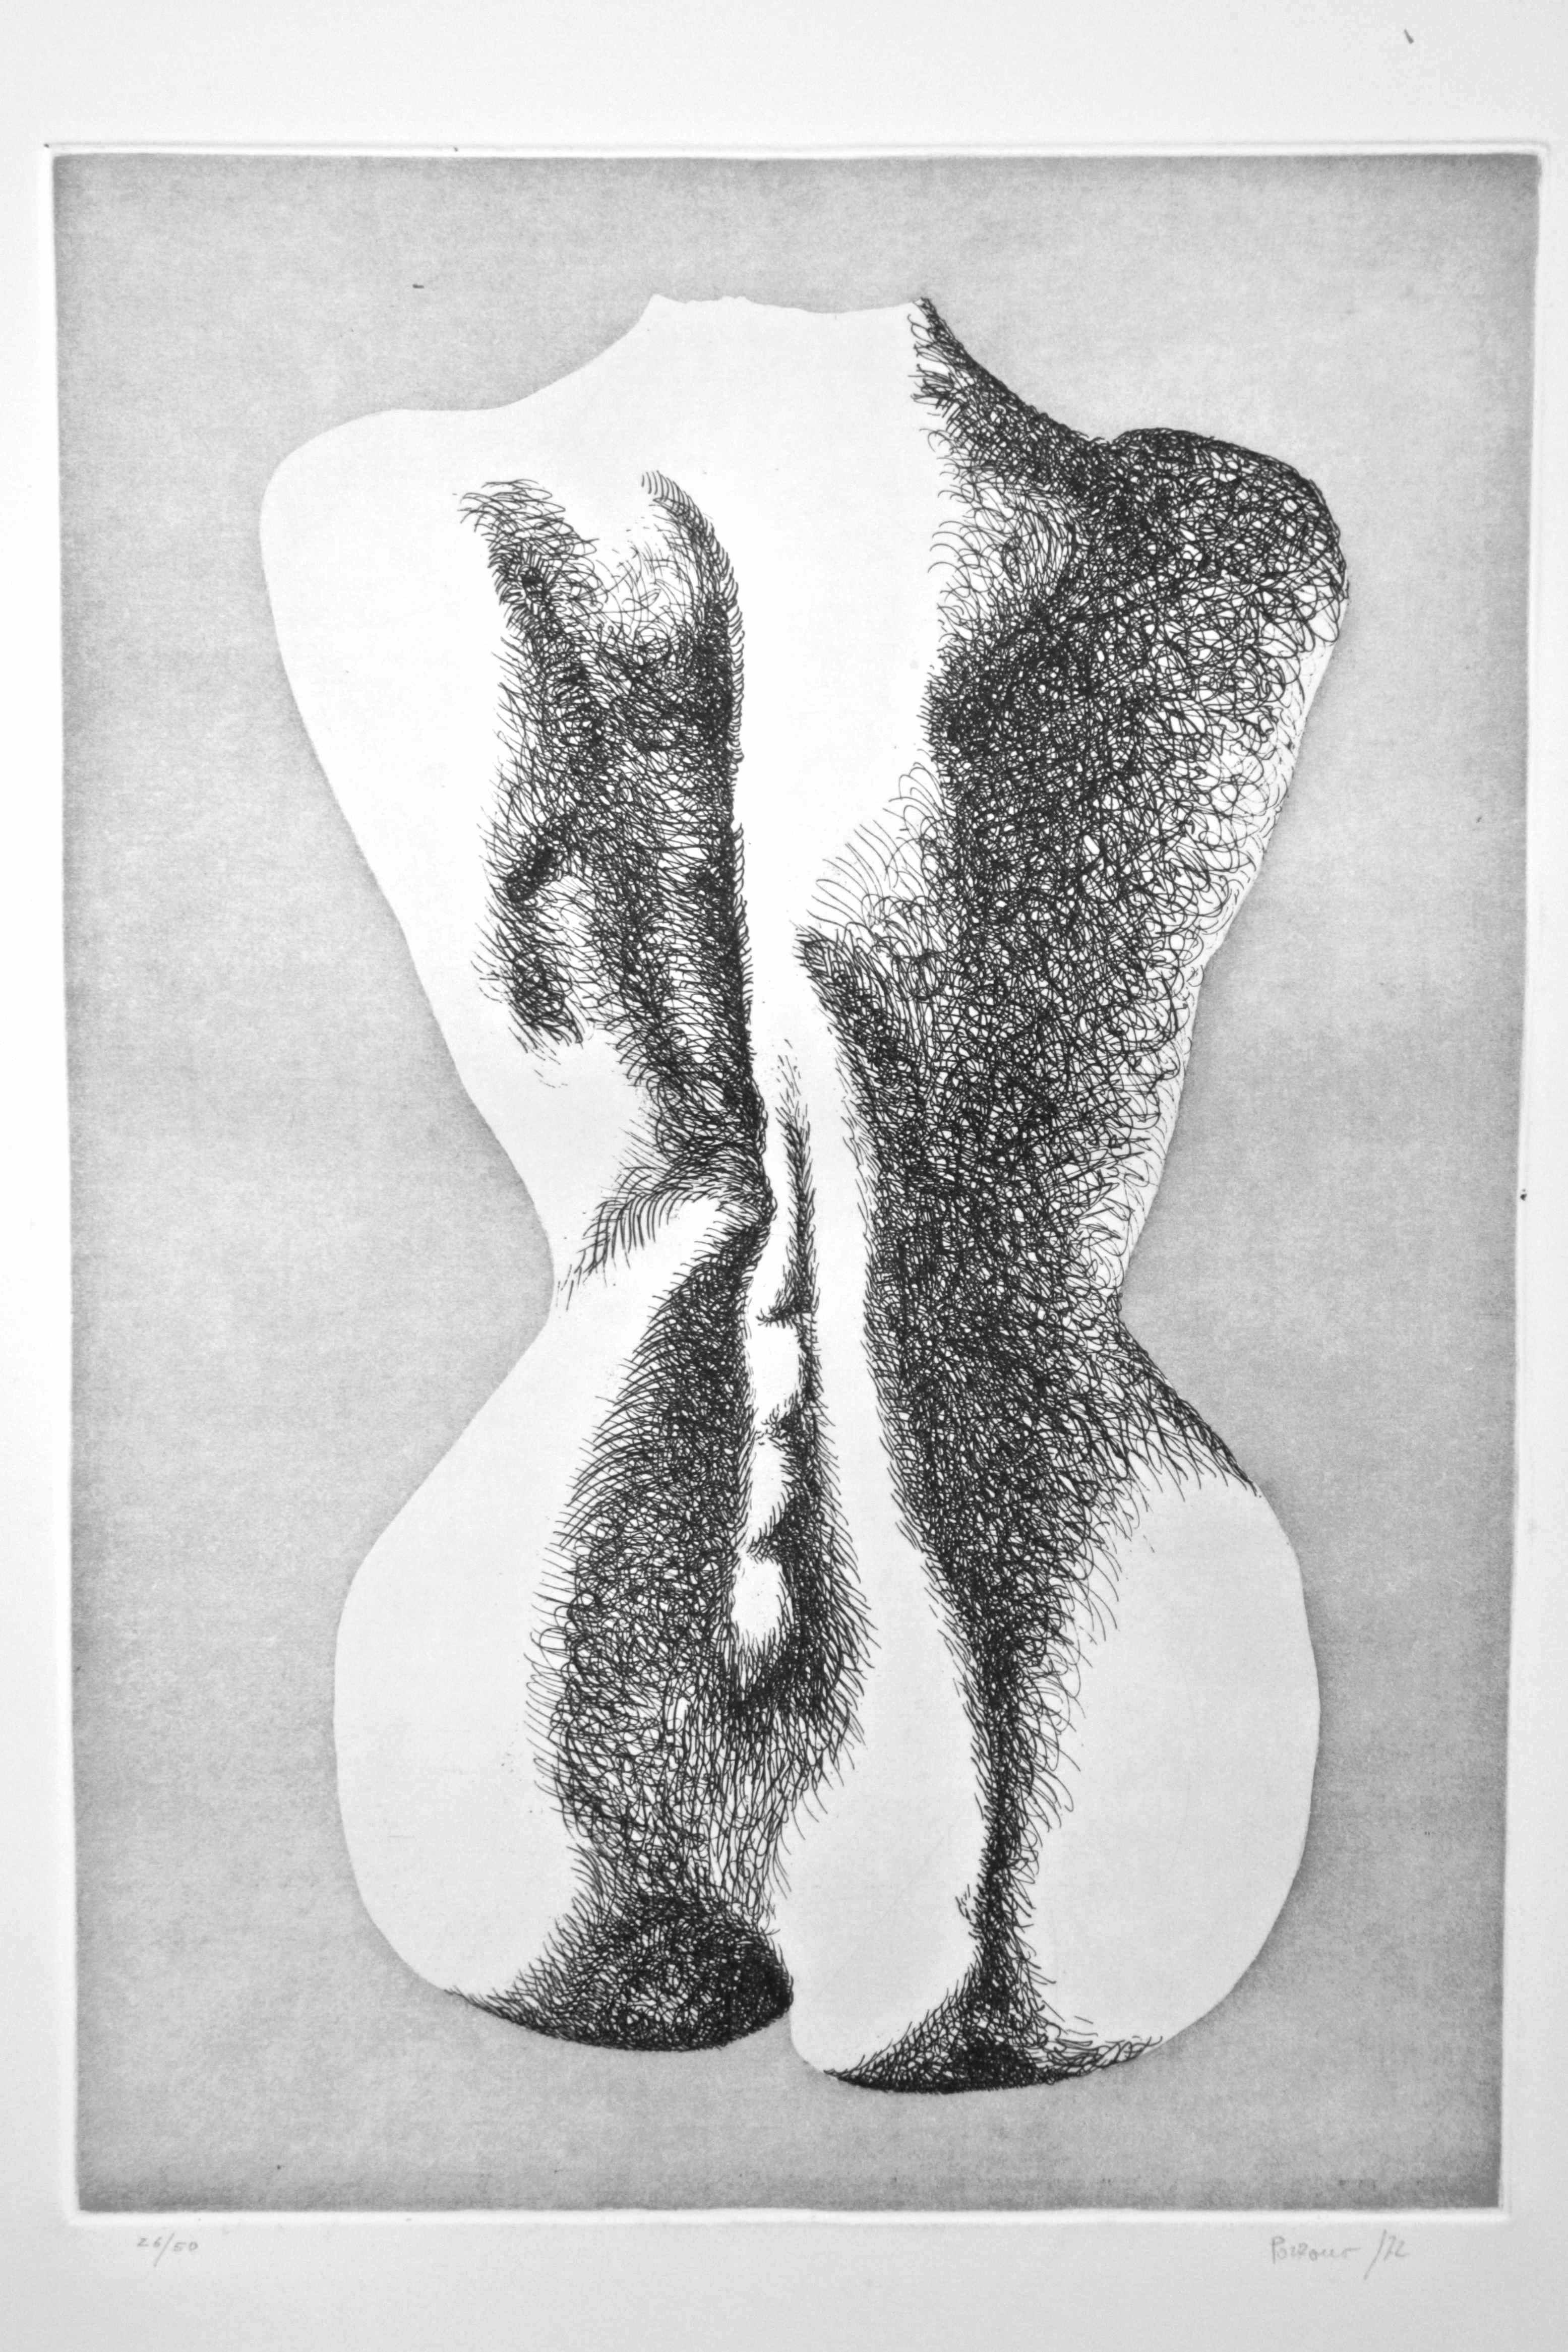 Nude from the Back - Original Etching by Giacomo Porzano - 1972